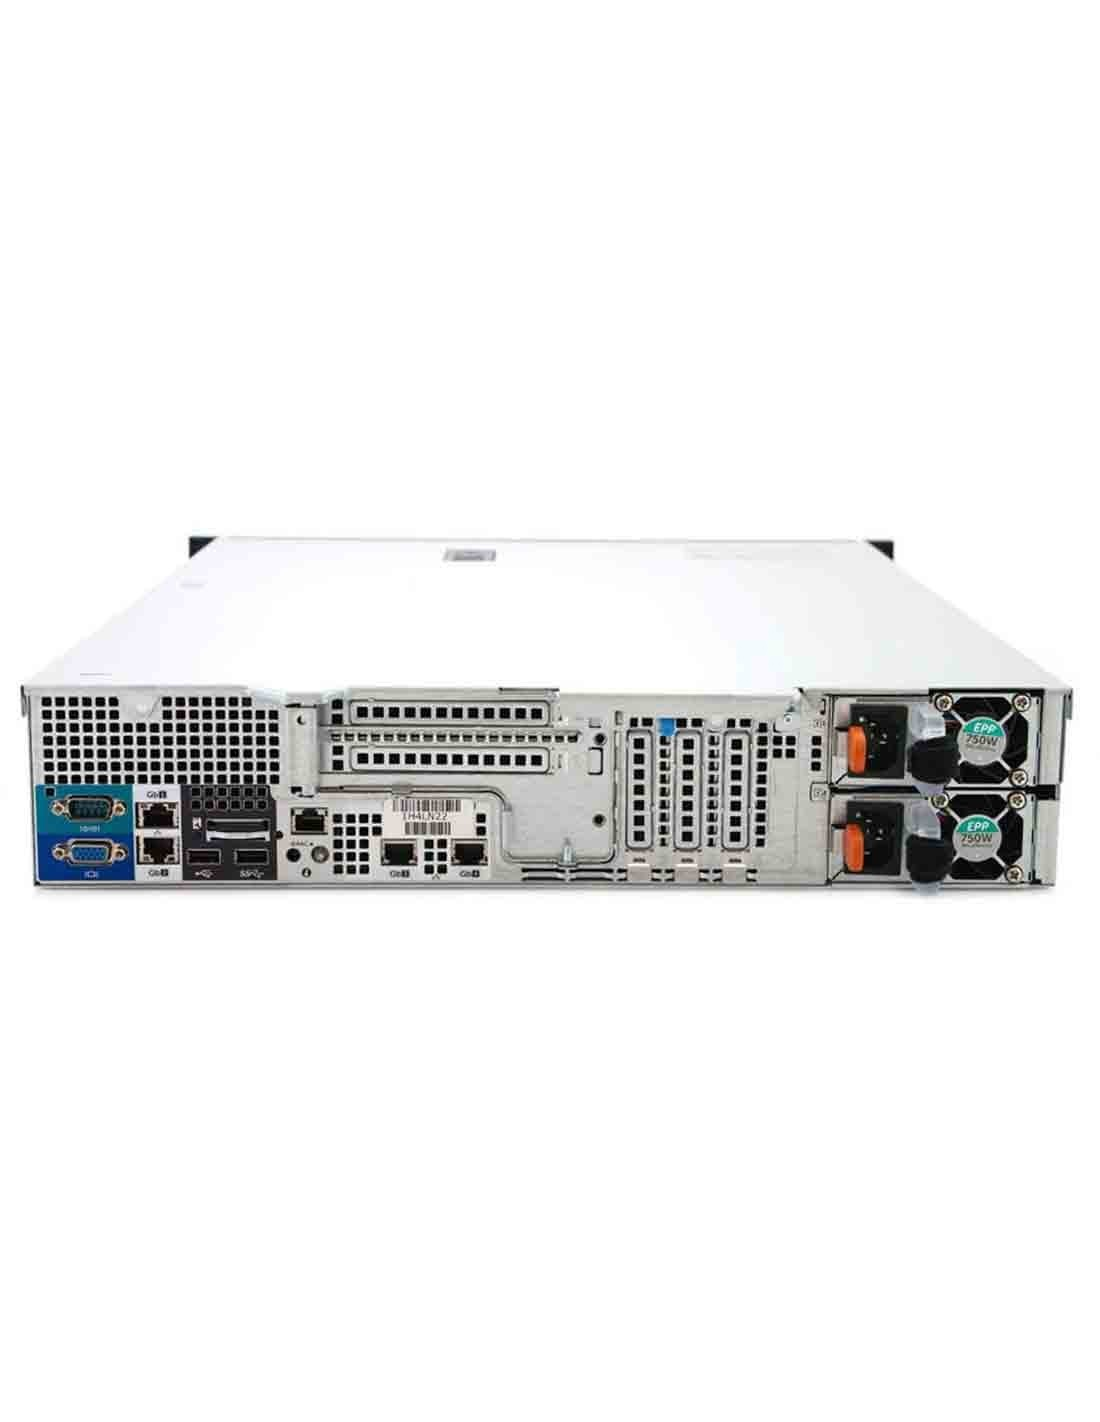 Dell PowerEdge R530 Rack Server Intel Xeon E5-2620v3 with best deal options in Dubai UAE